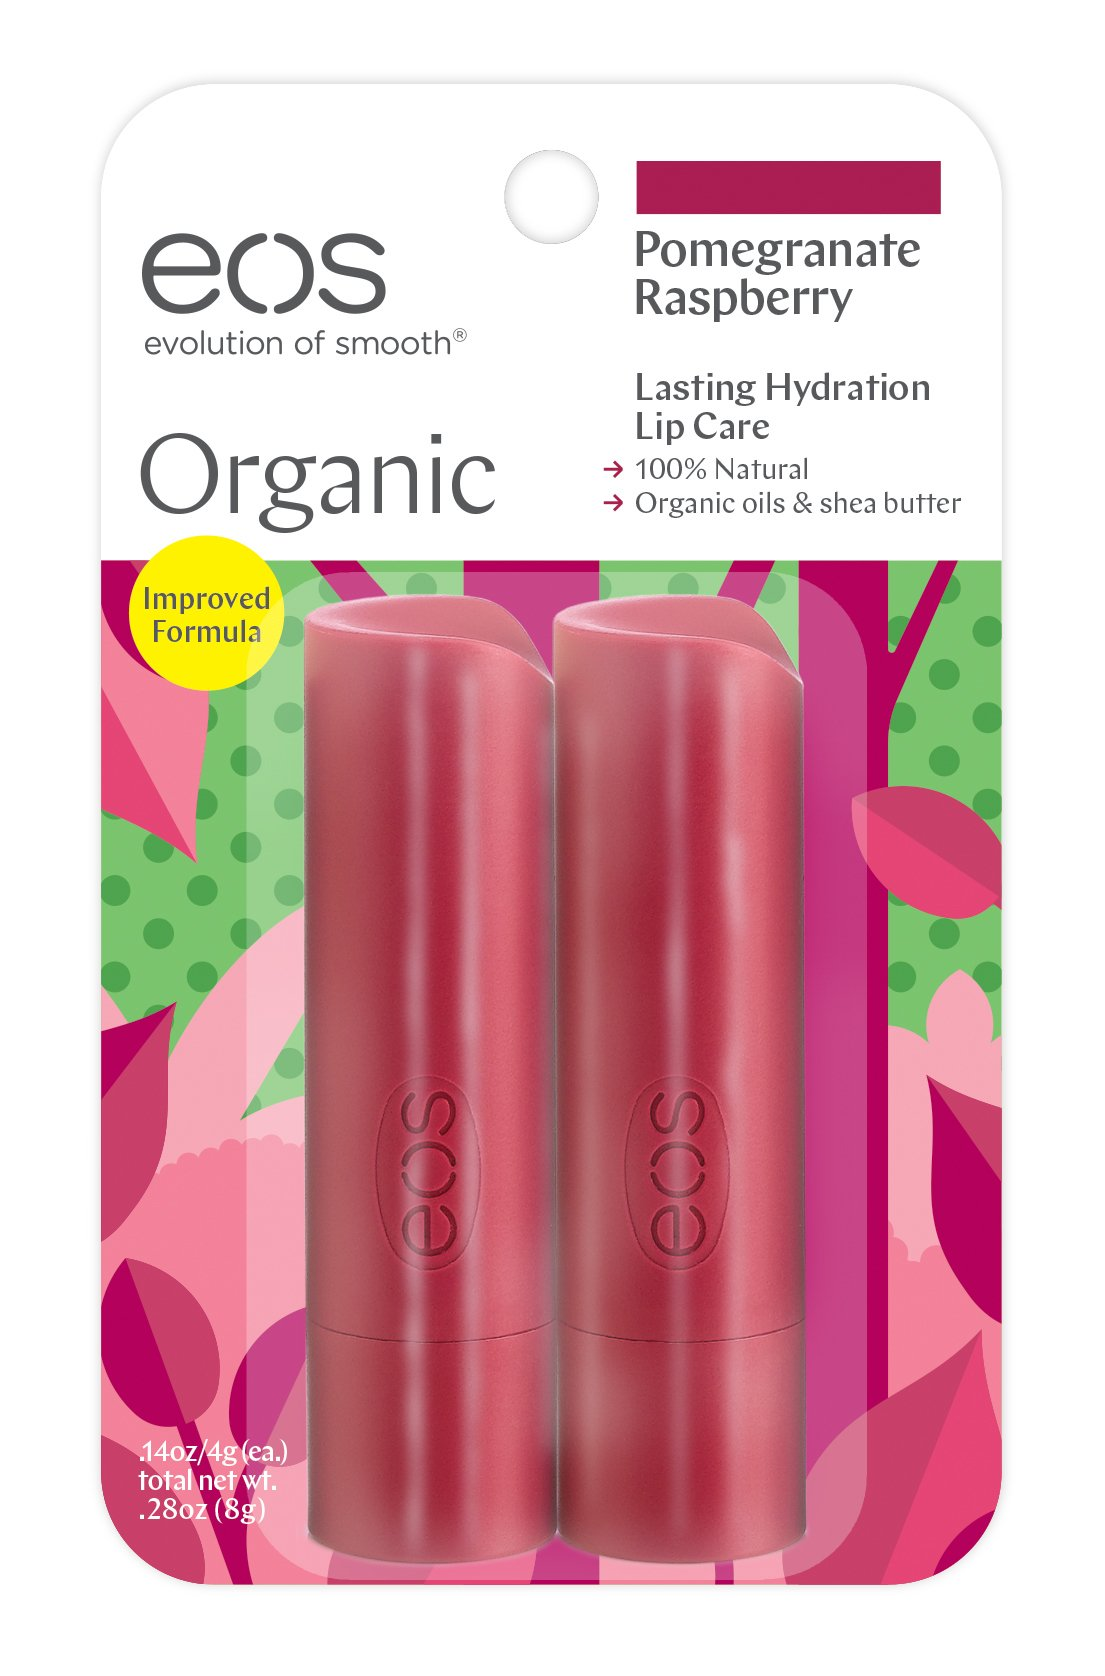 EOS 2 Piece Organic Lip Balm Stick, Pomegranate Raspberry, 0.28 Ounce